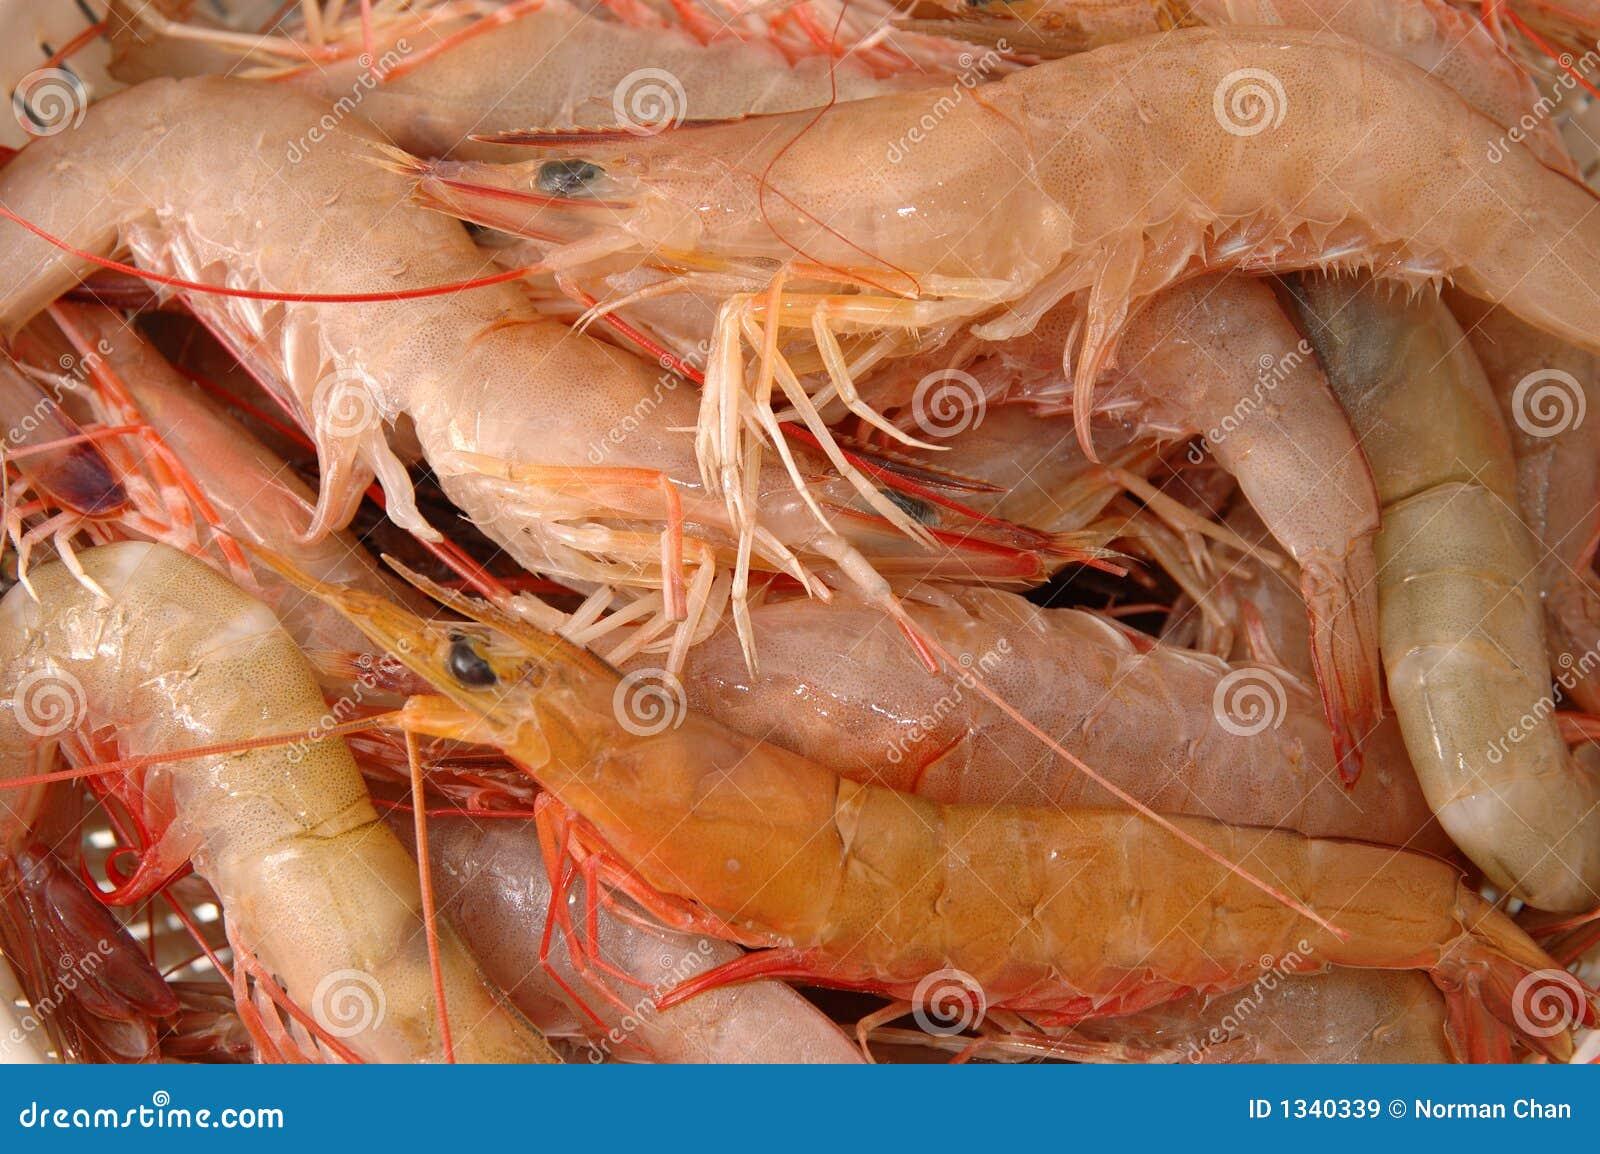 Live shrimp stock image. Image of ocean, meat, close, orange - 1340339